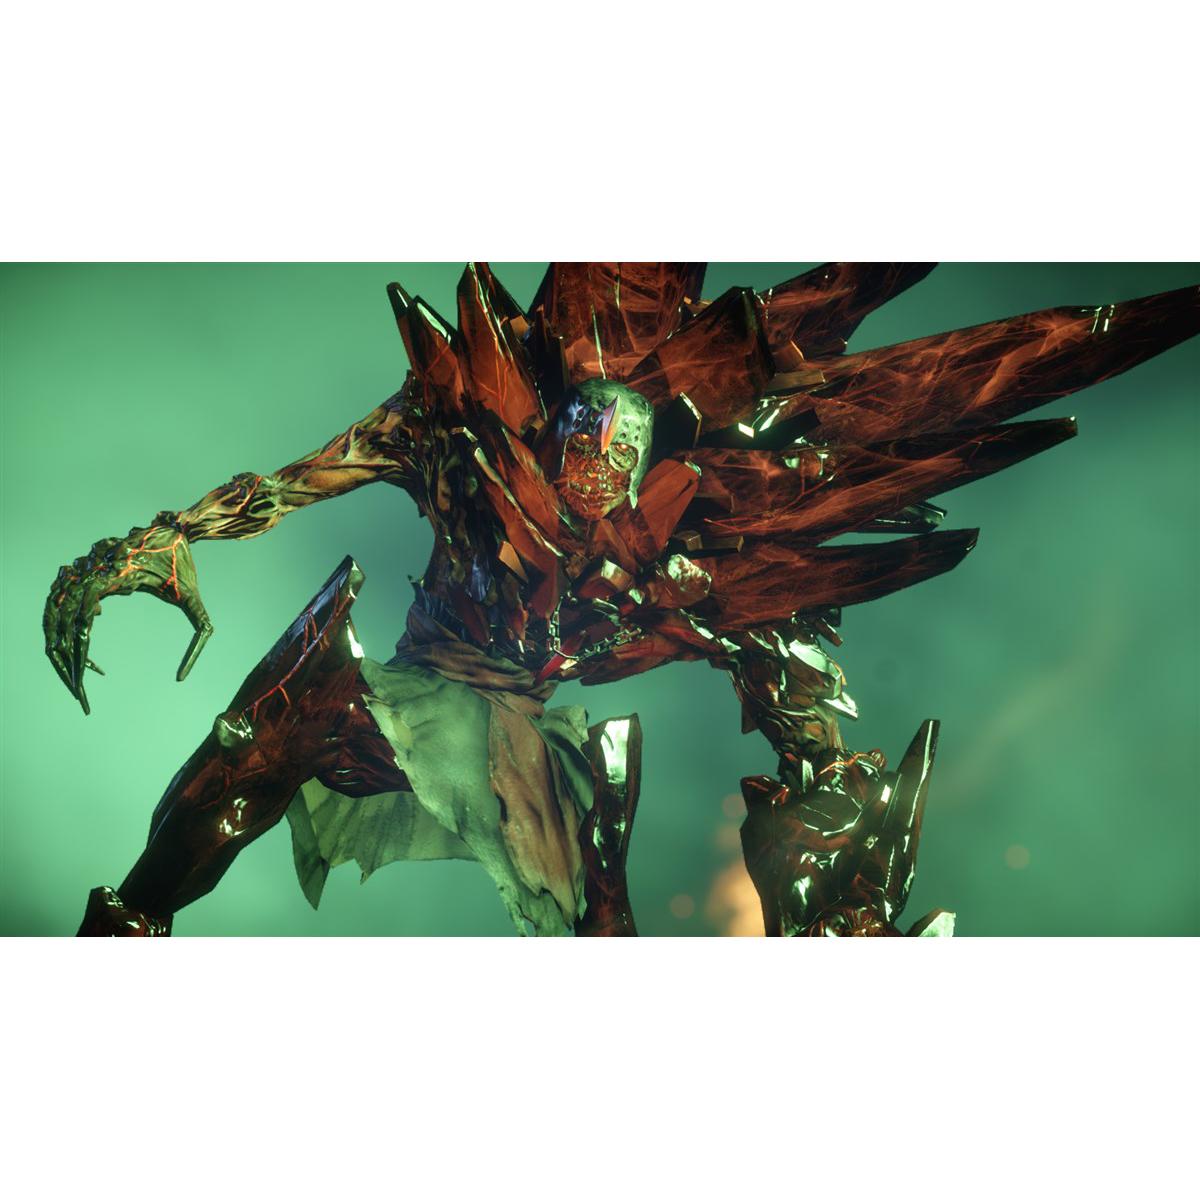 Joc Dragon Age: Inquisition pentru PlayStation 3 11